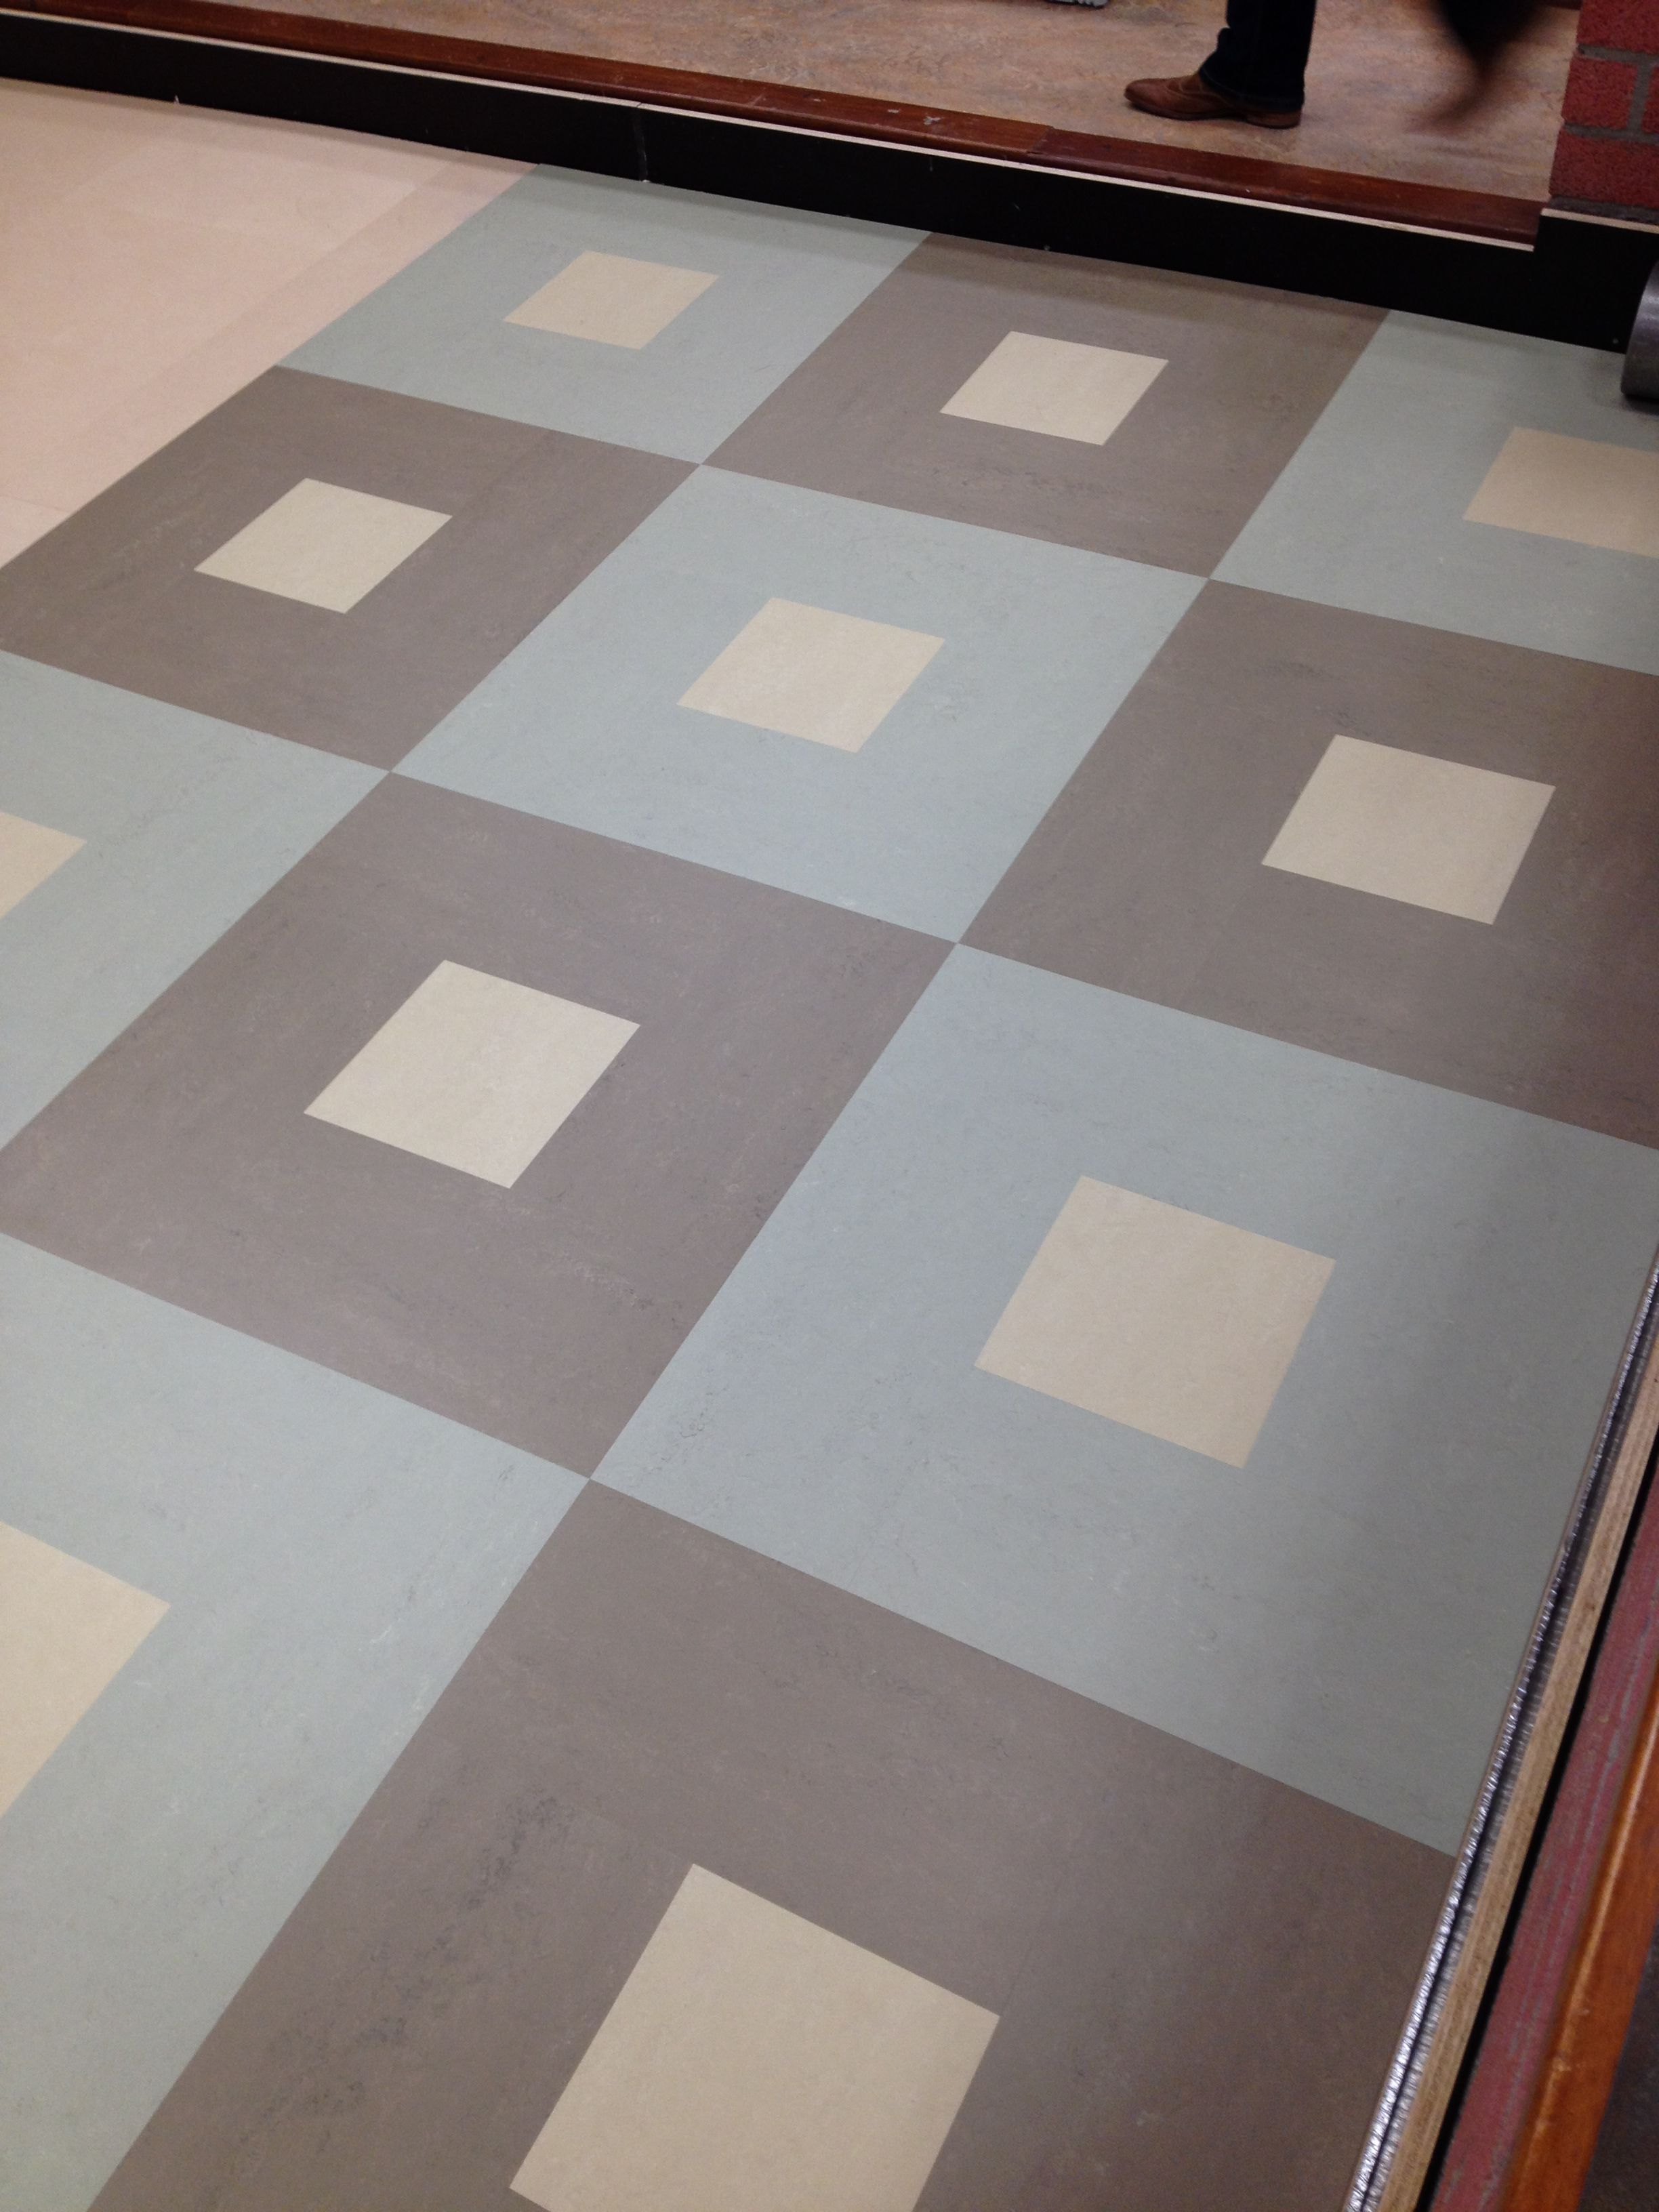 Marmoleum Modular Patterned floor tiles, Vct flooring